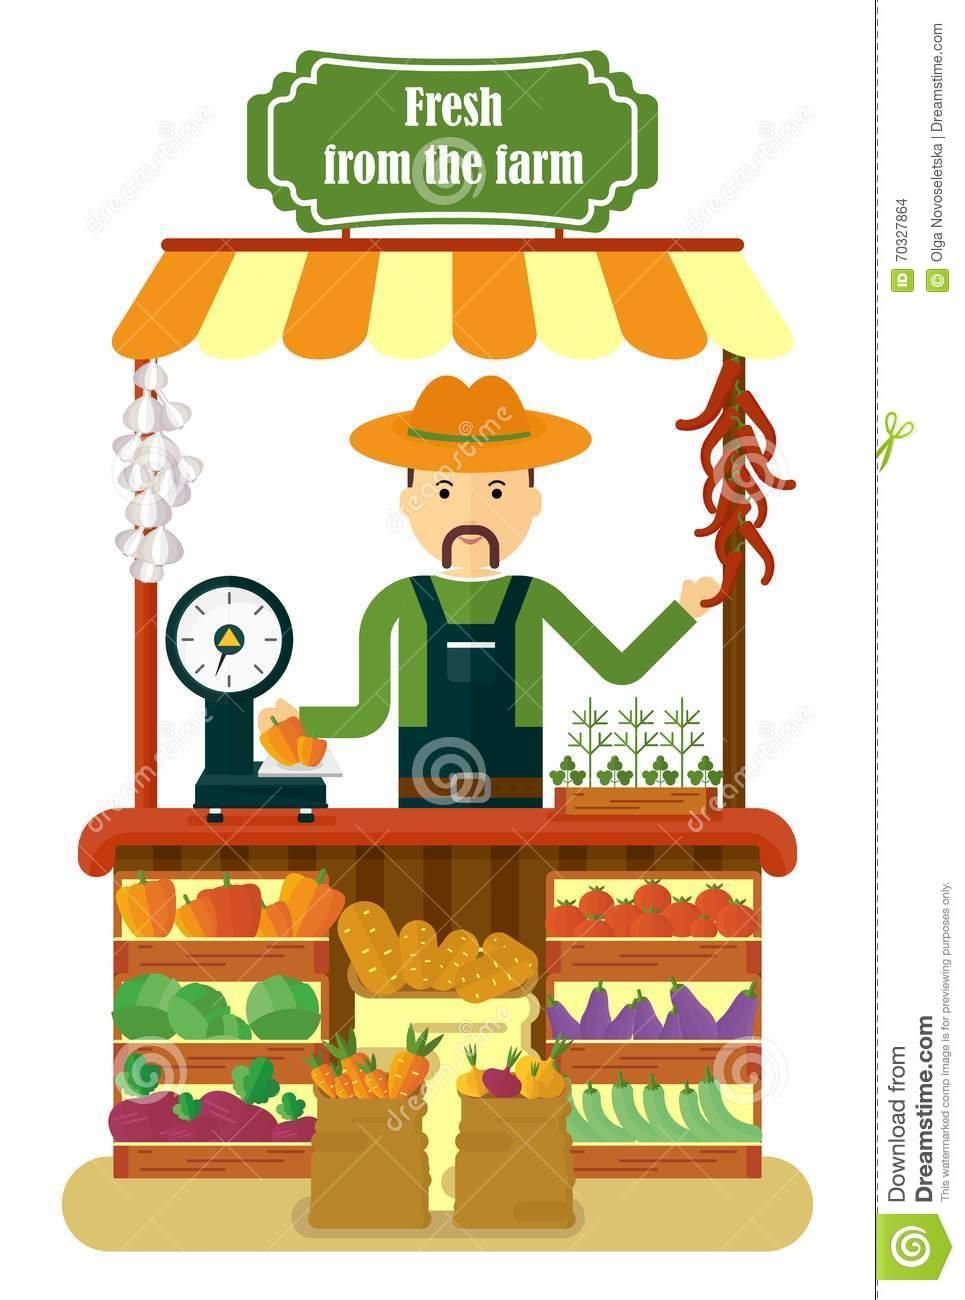 Local Market Farmer Selling Vegetables Produce Stock Vector.